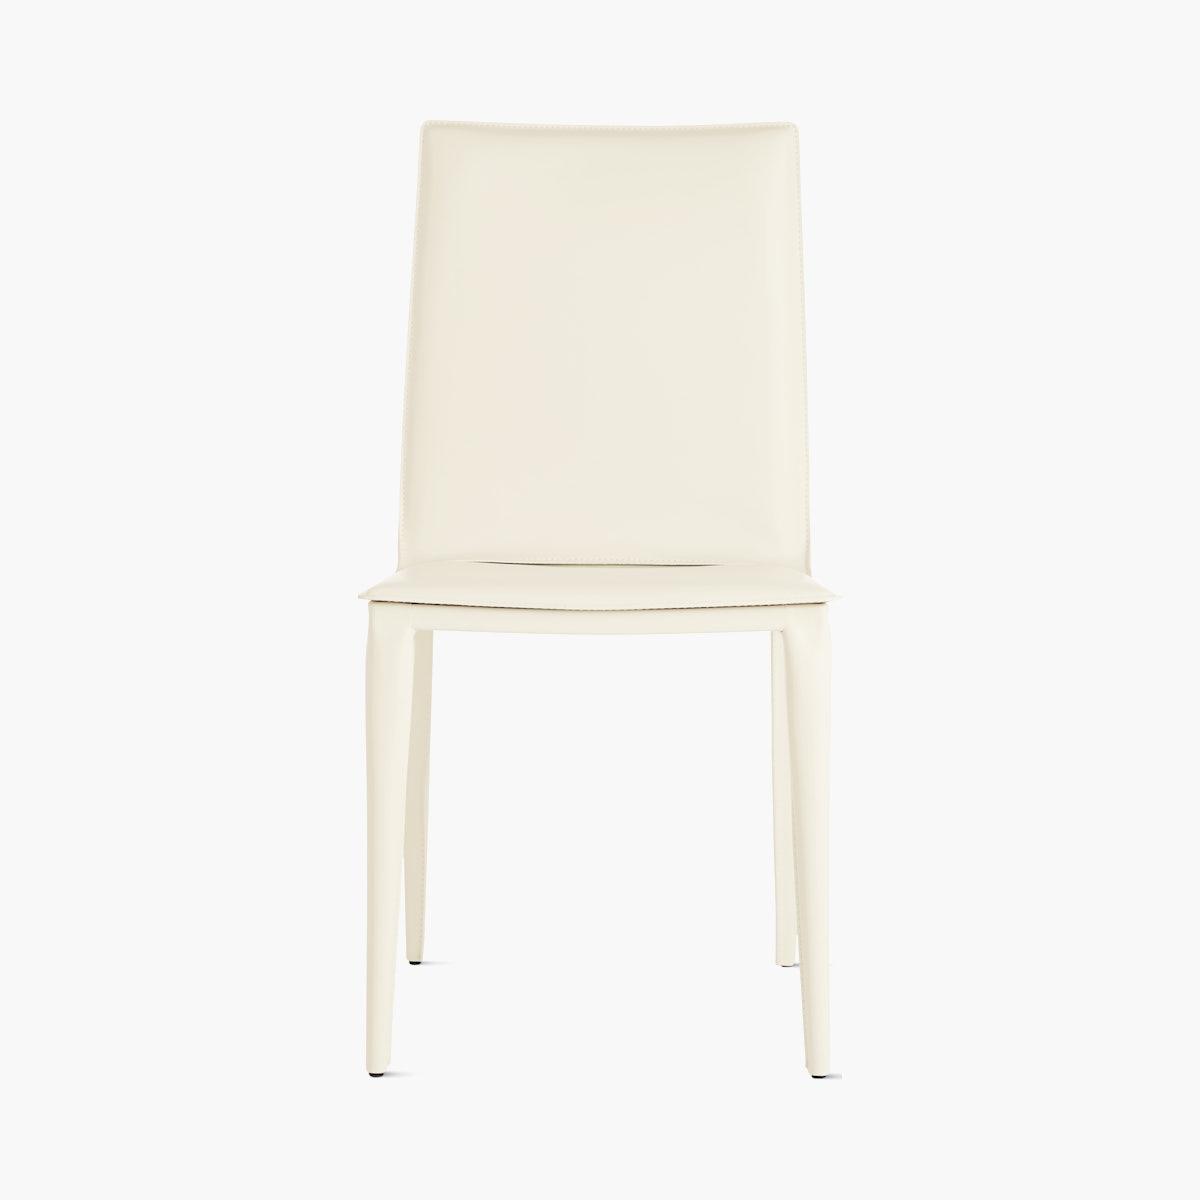 Bottega Chair